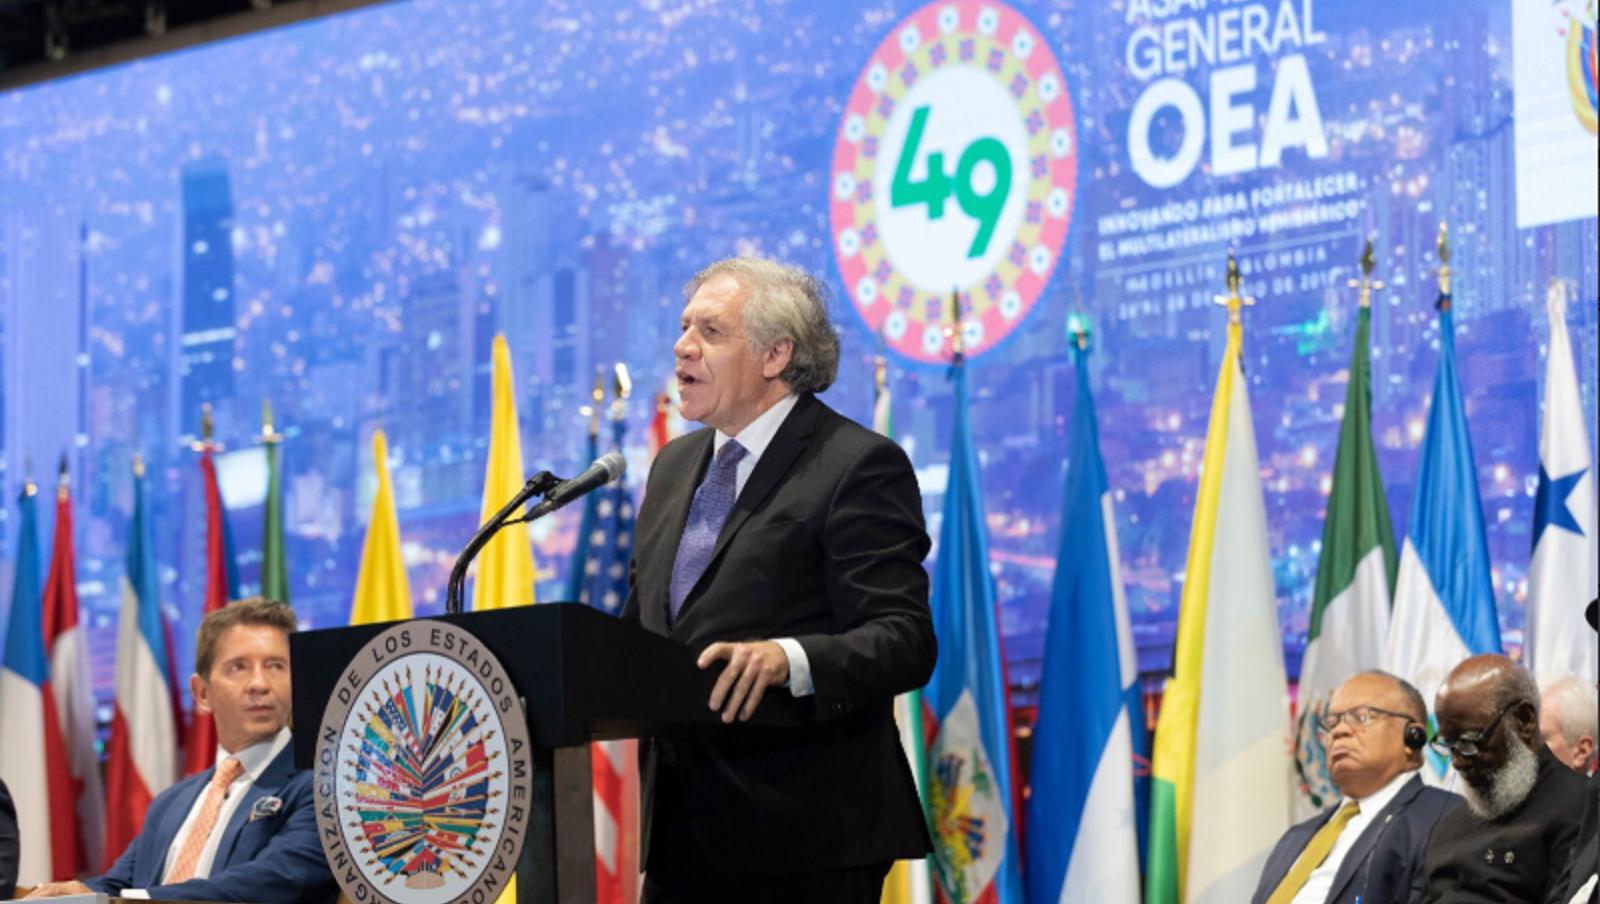 Durante inauguración de Asamblea de la OEA Almagro critica gestión de Bachelet